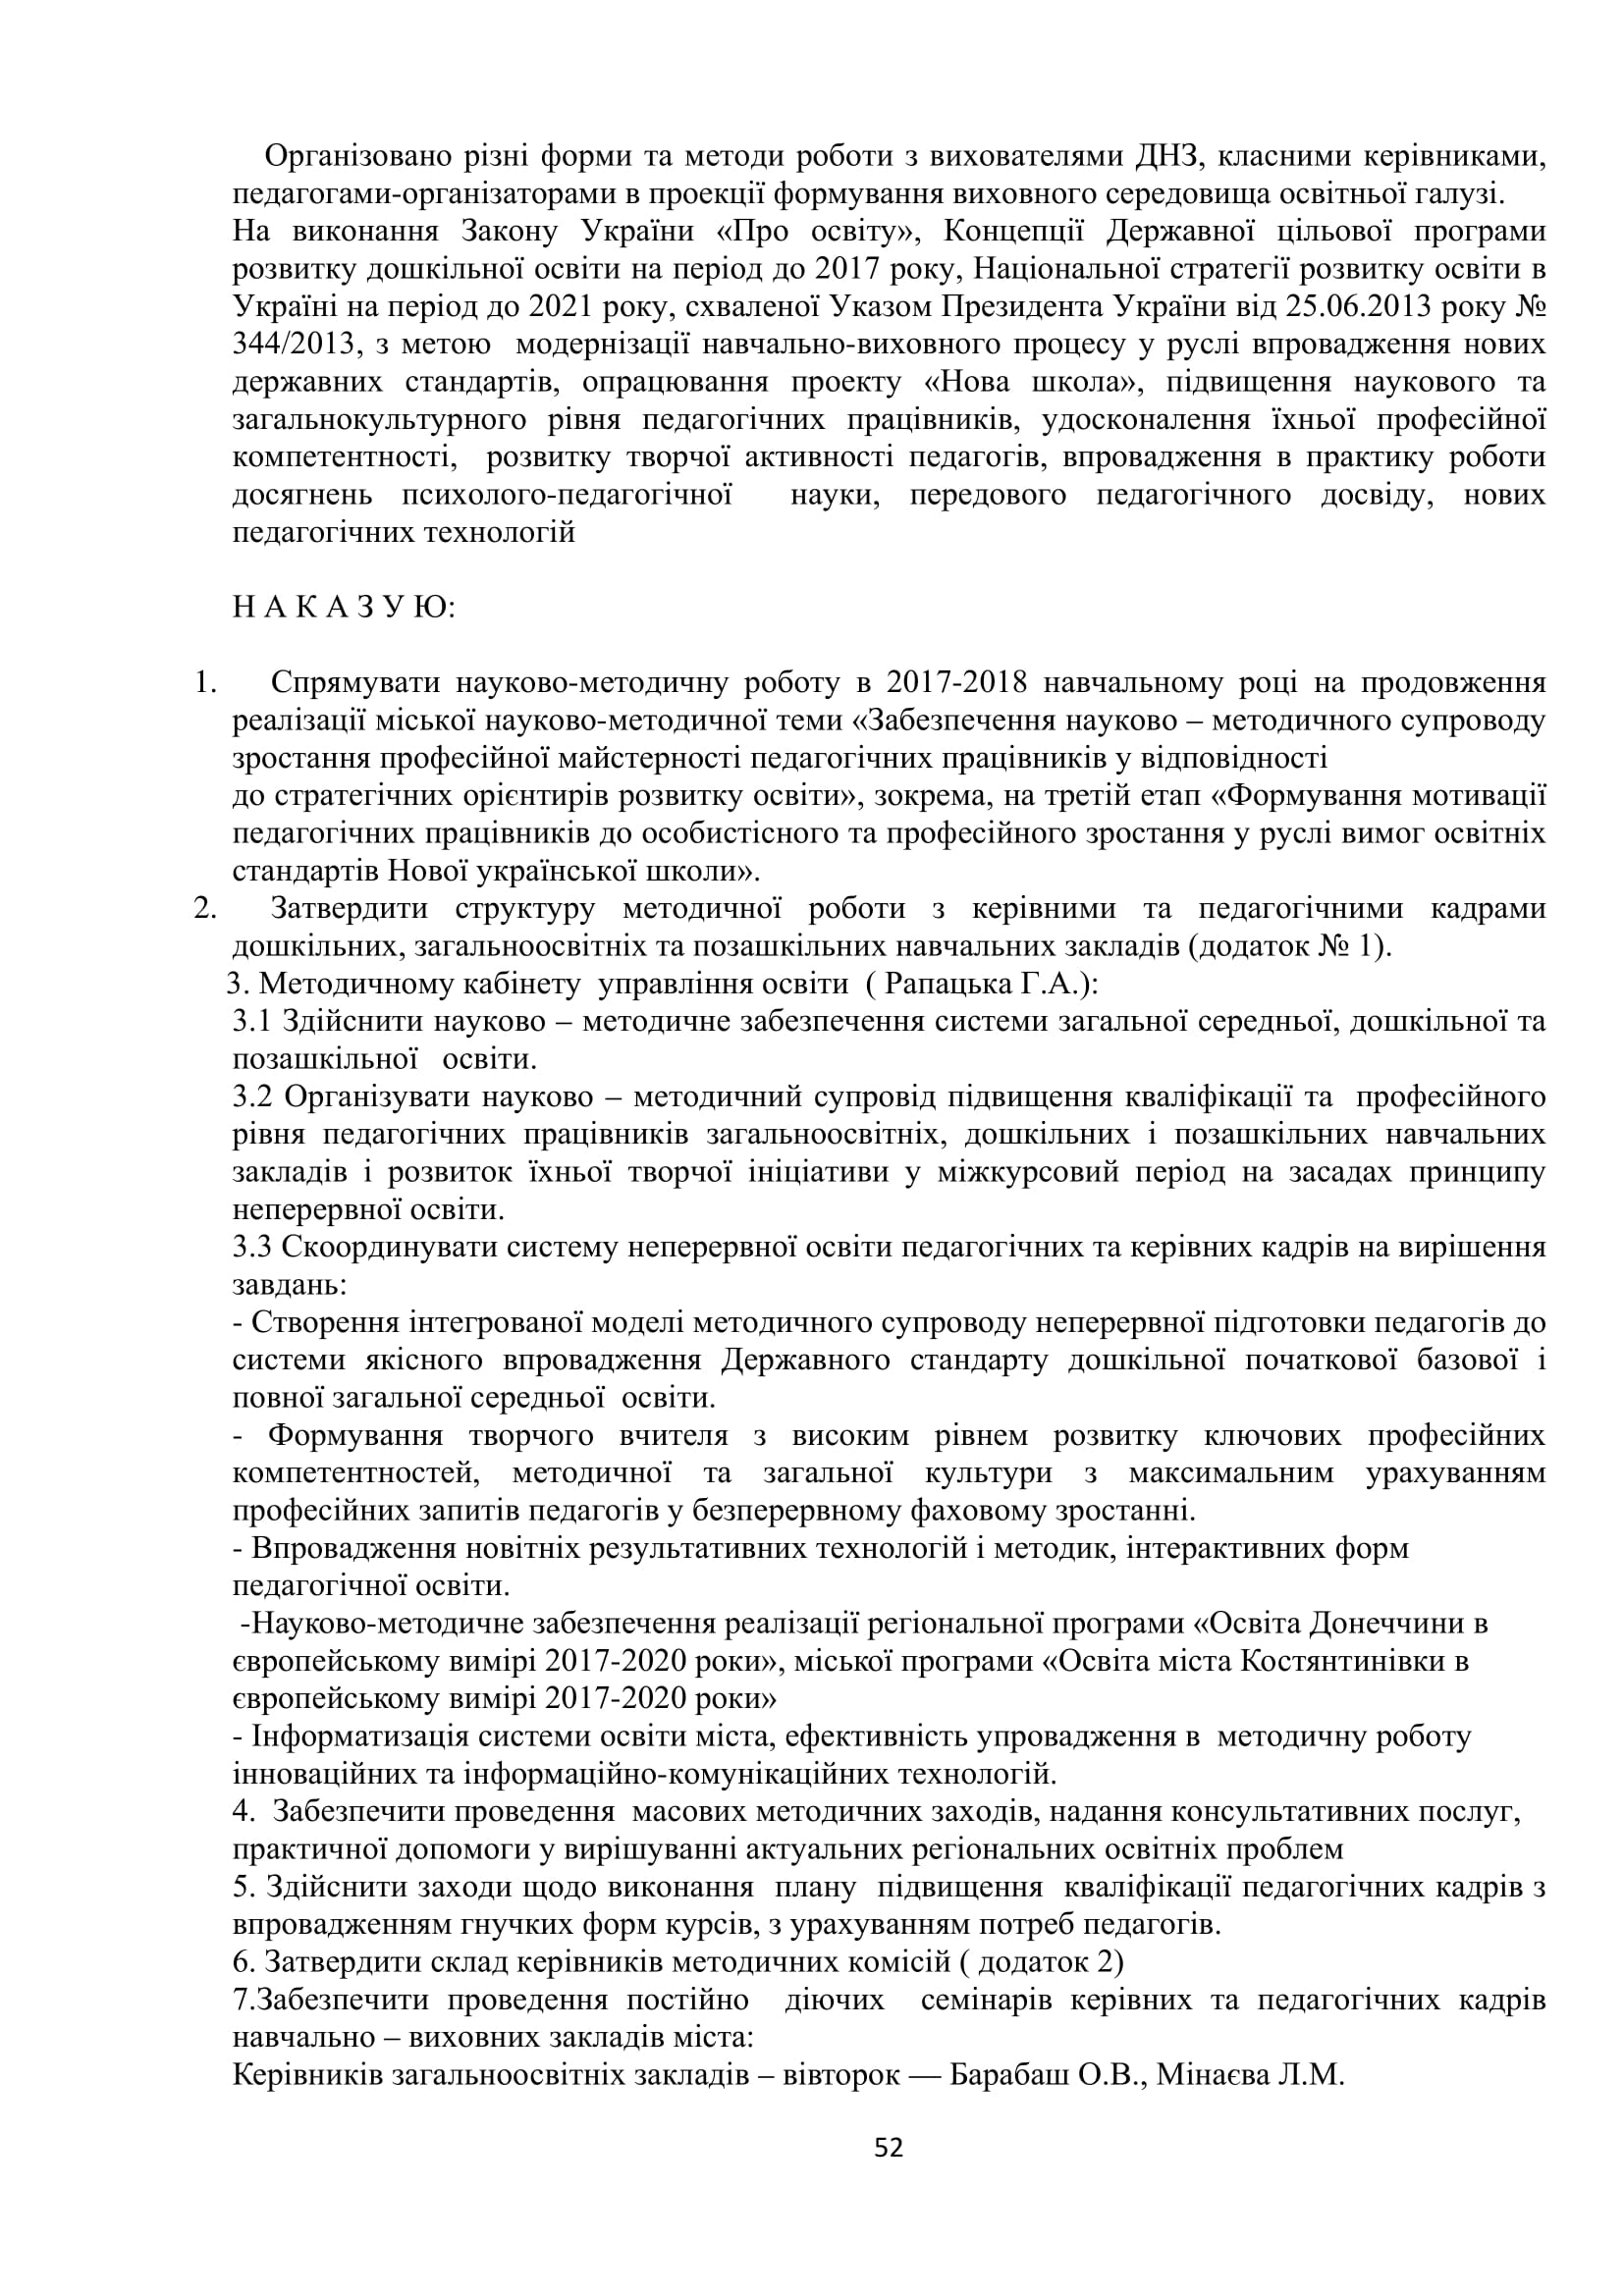 2017-2018 - ММК план роботи-53